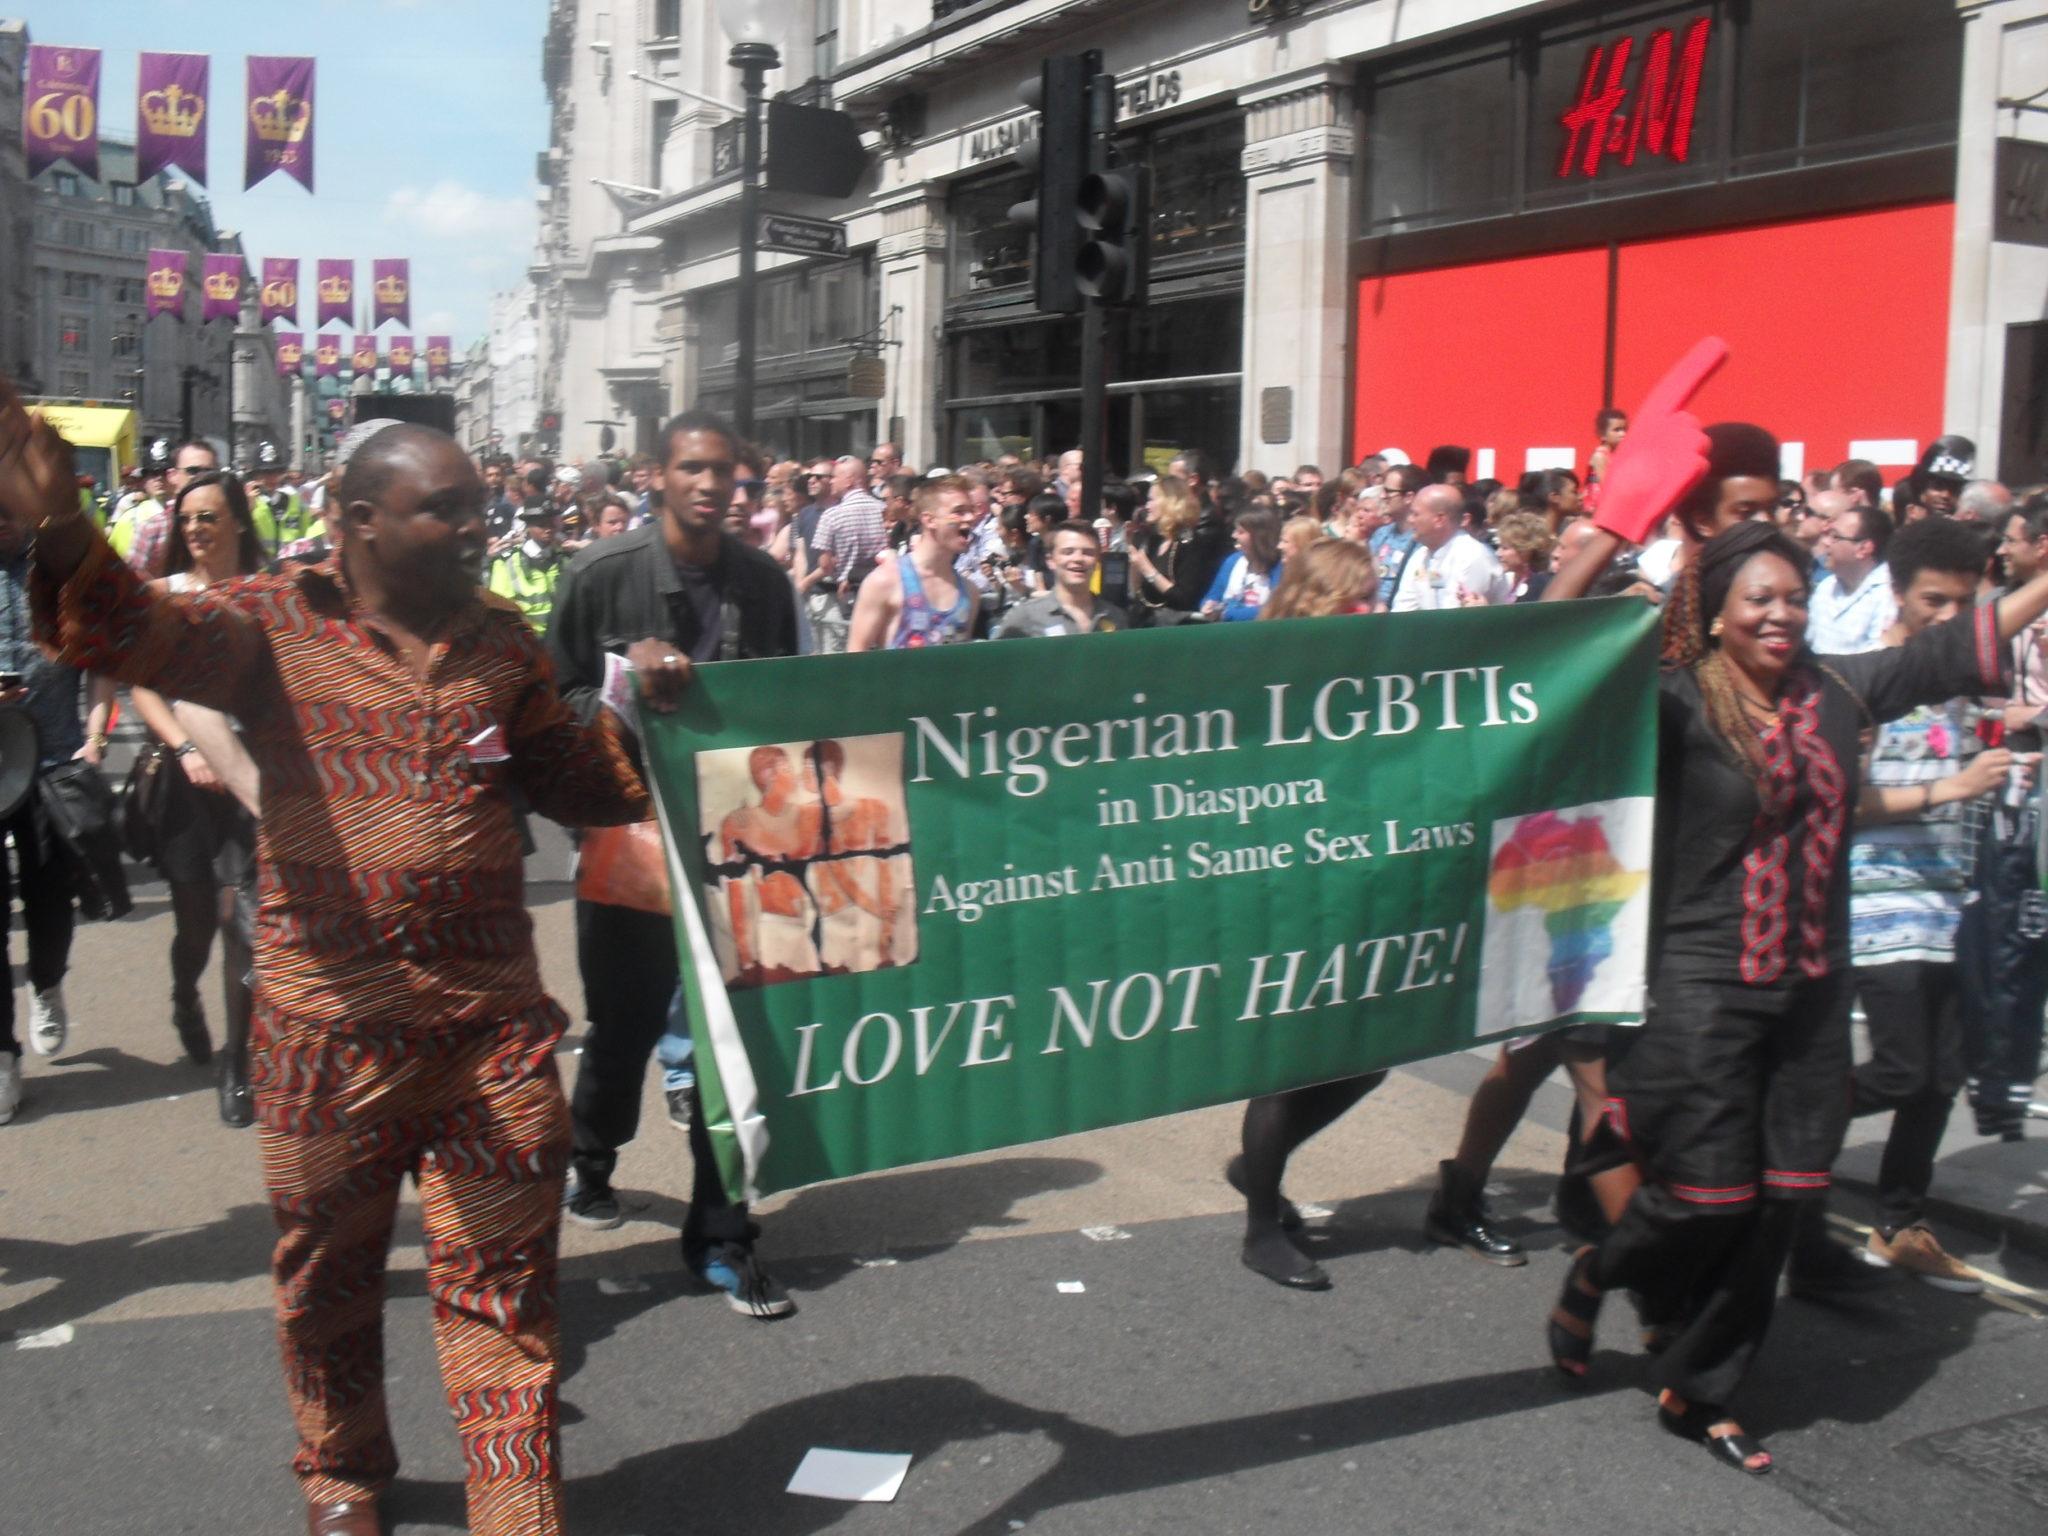 gay keniota siti di incontri